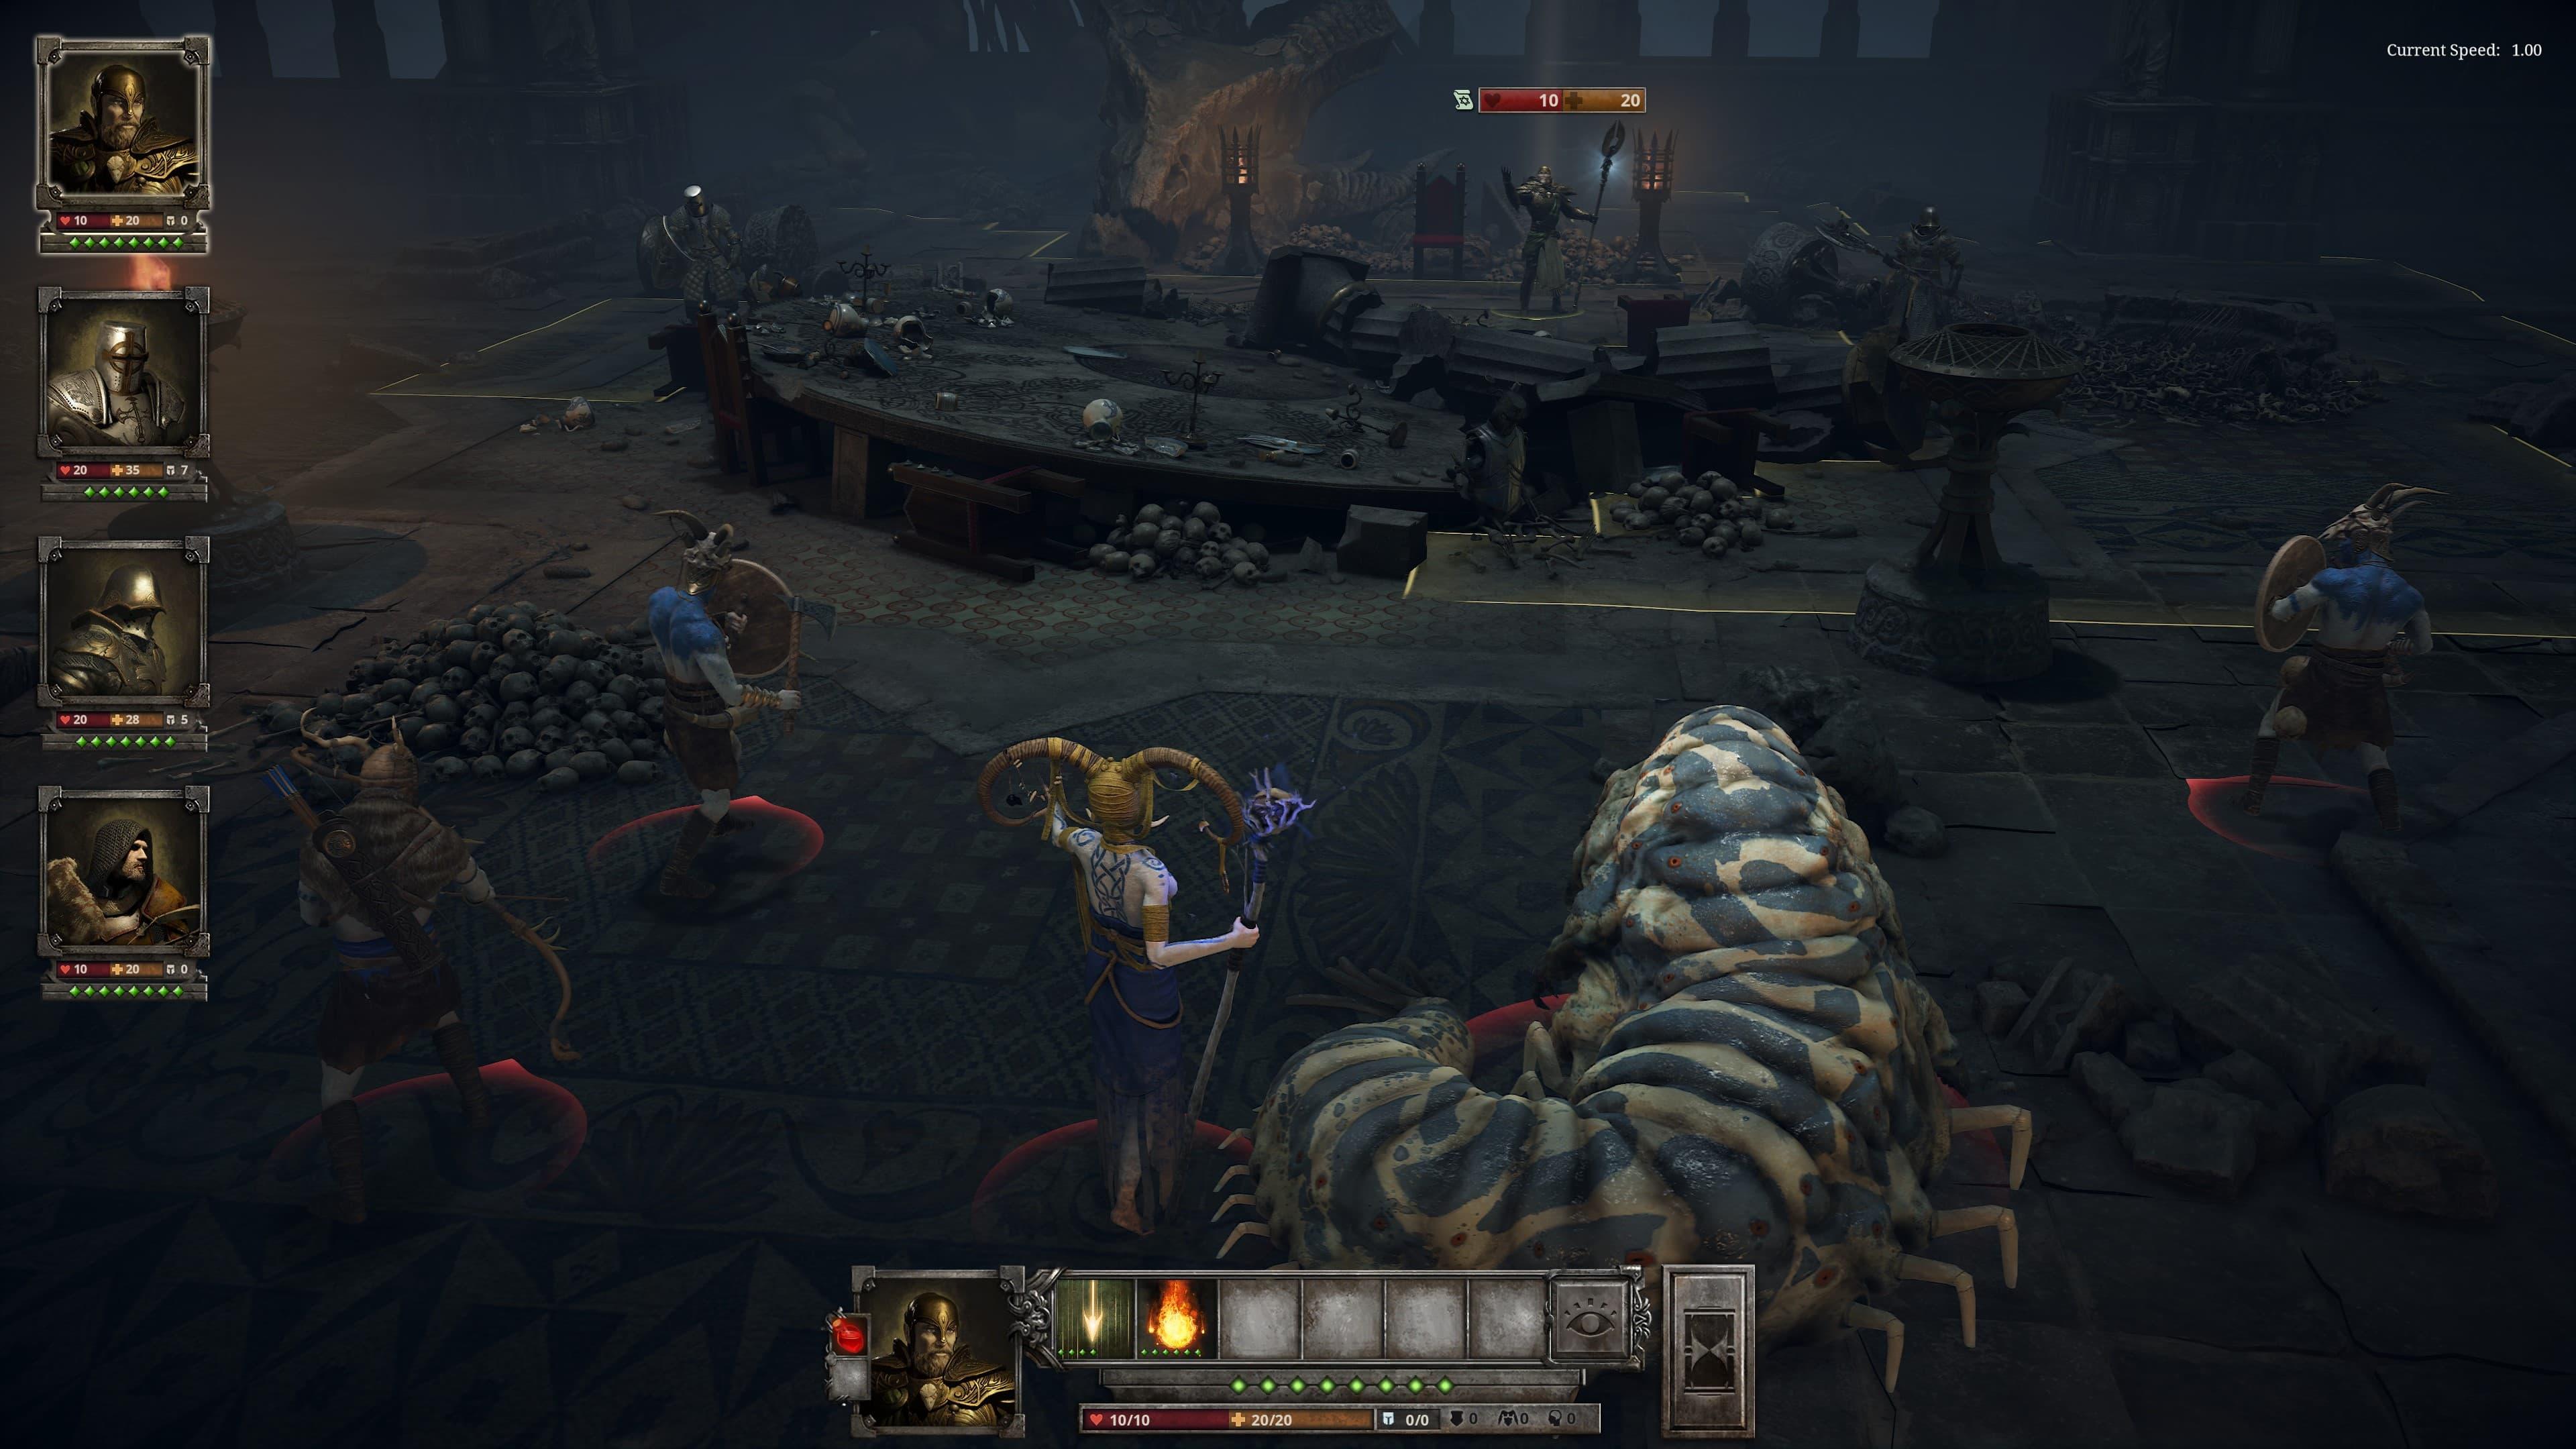 King Arthur: Knight's Tale Xbox